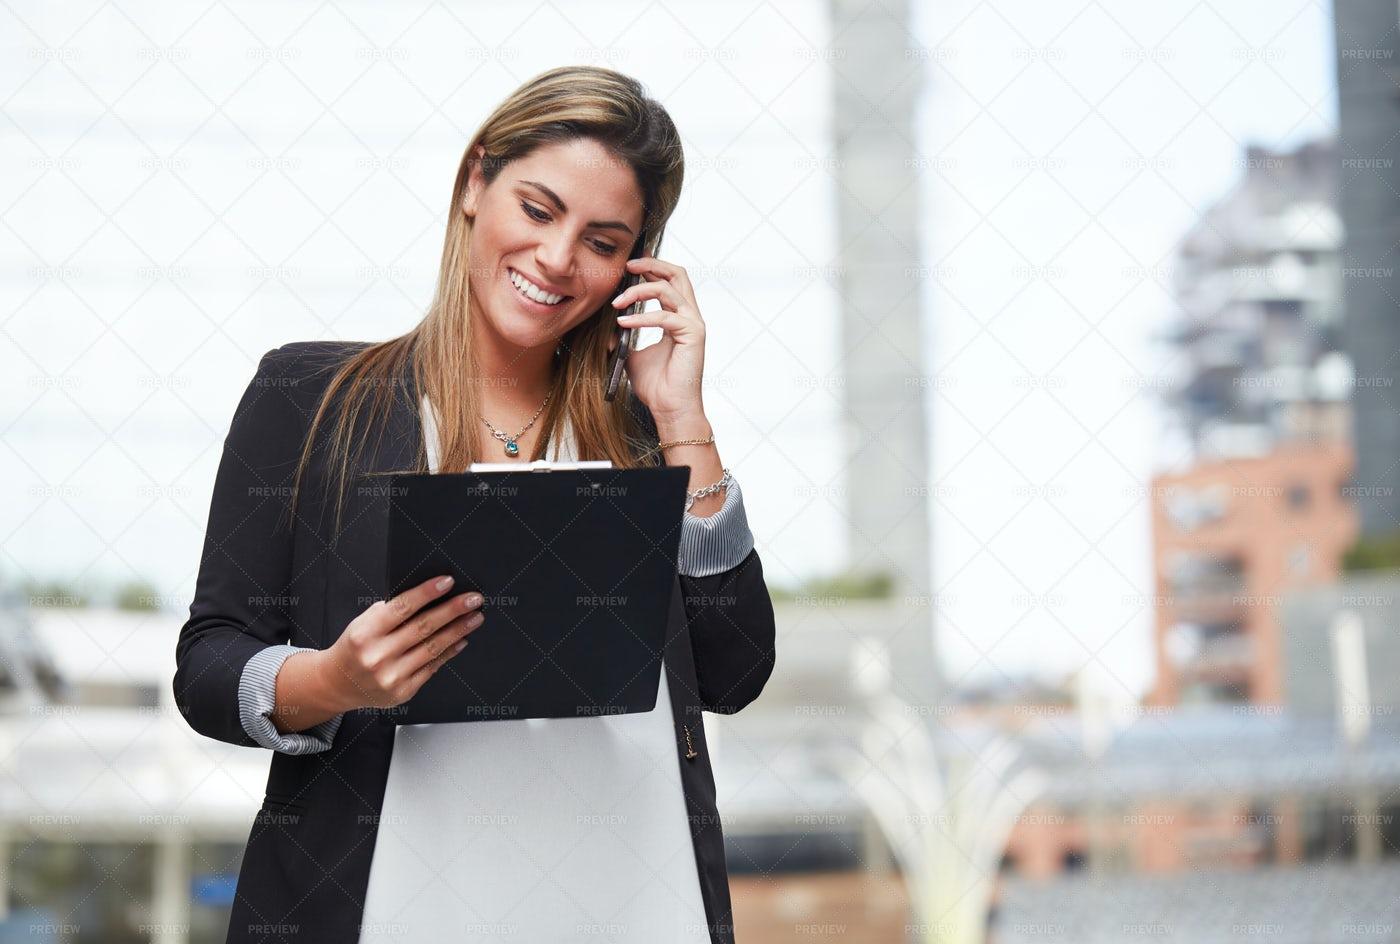 Businesswoman Discusses Notes: Stock Photos